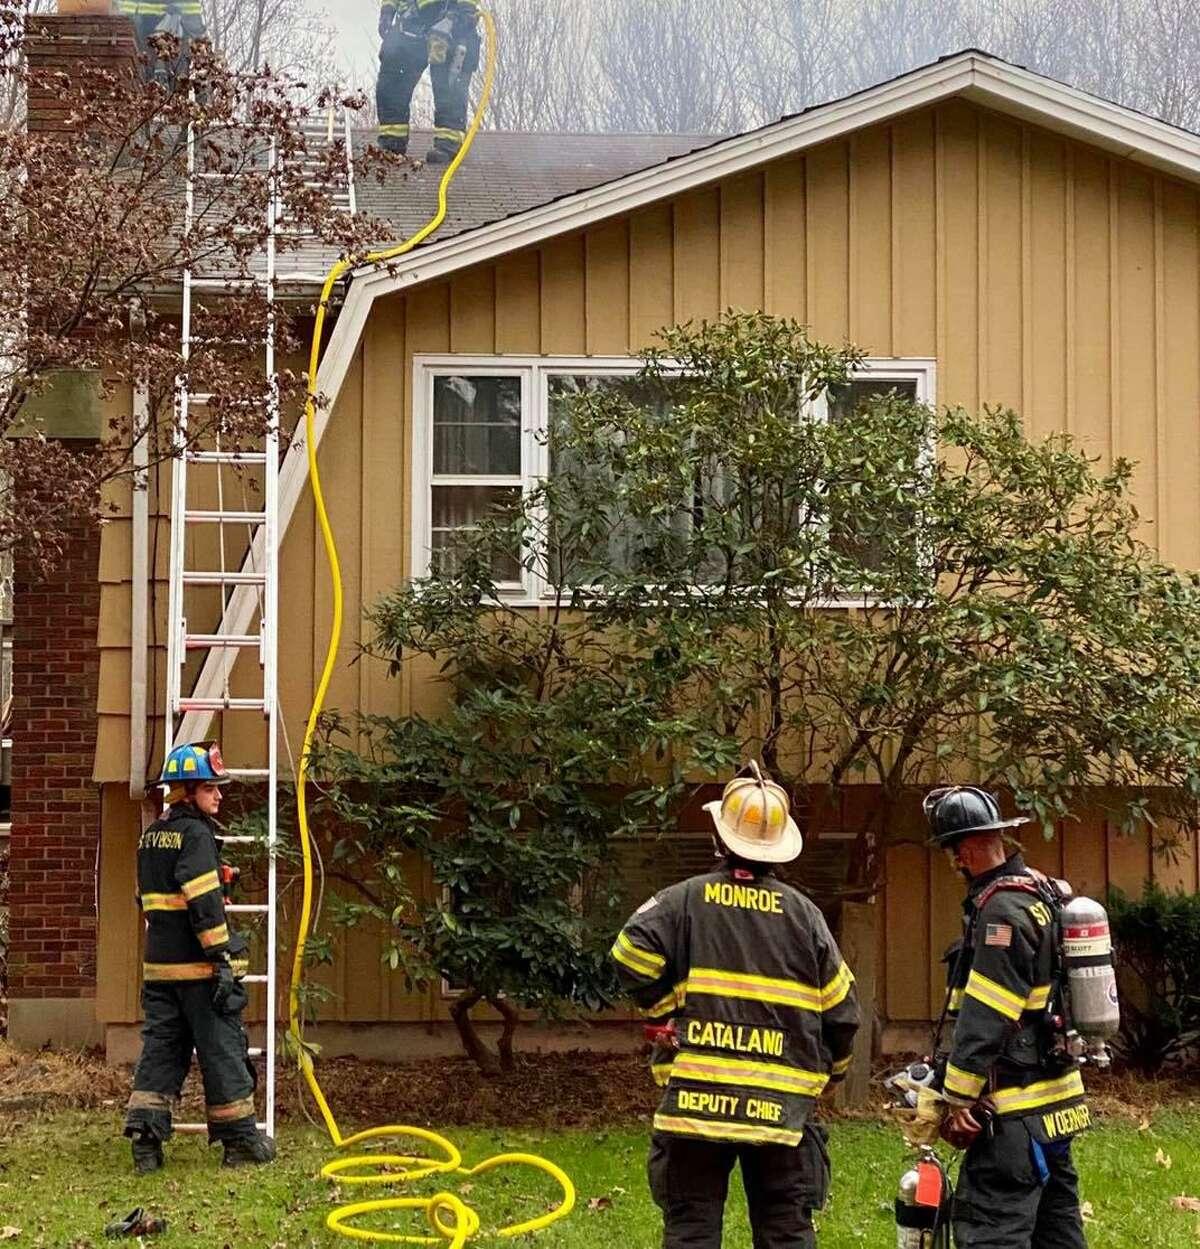 Crews on scene for a chimney fire on Shelton Road in Monroe, Conn., on Sunday, Nov. 15, 2020.